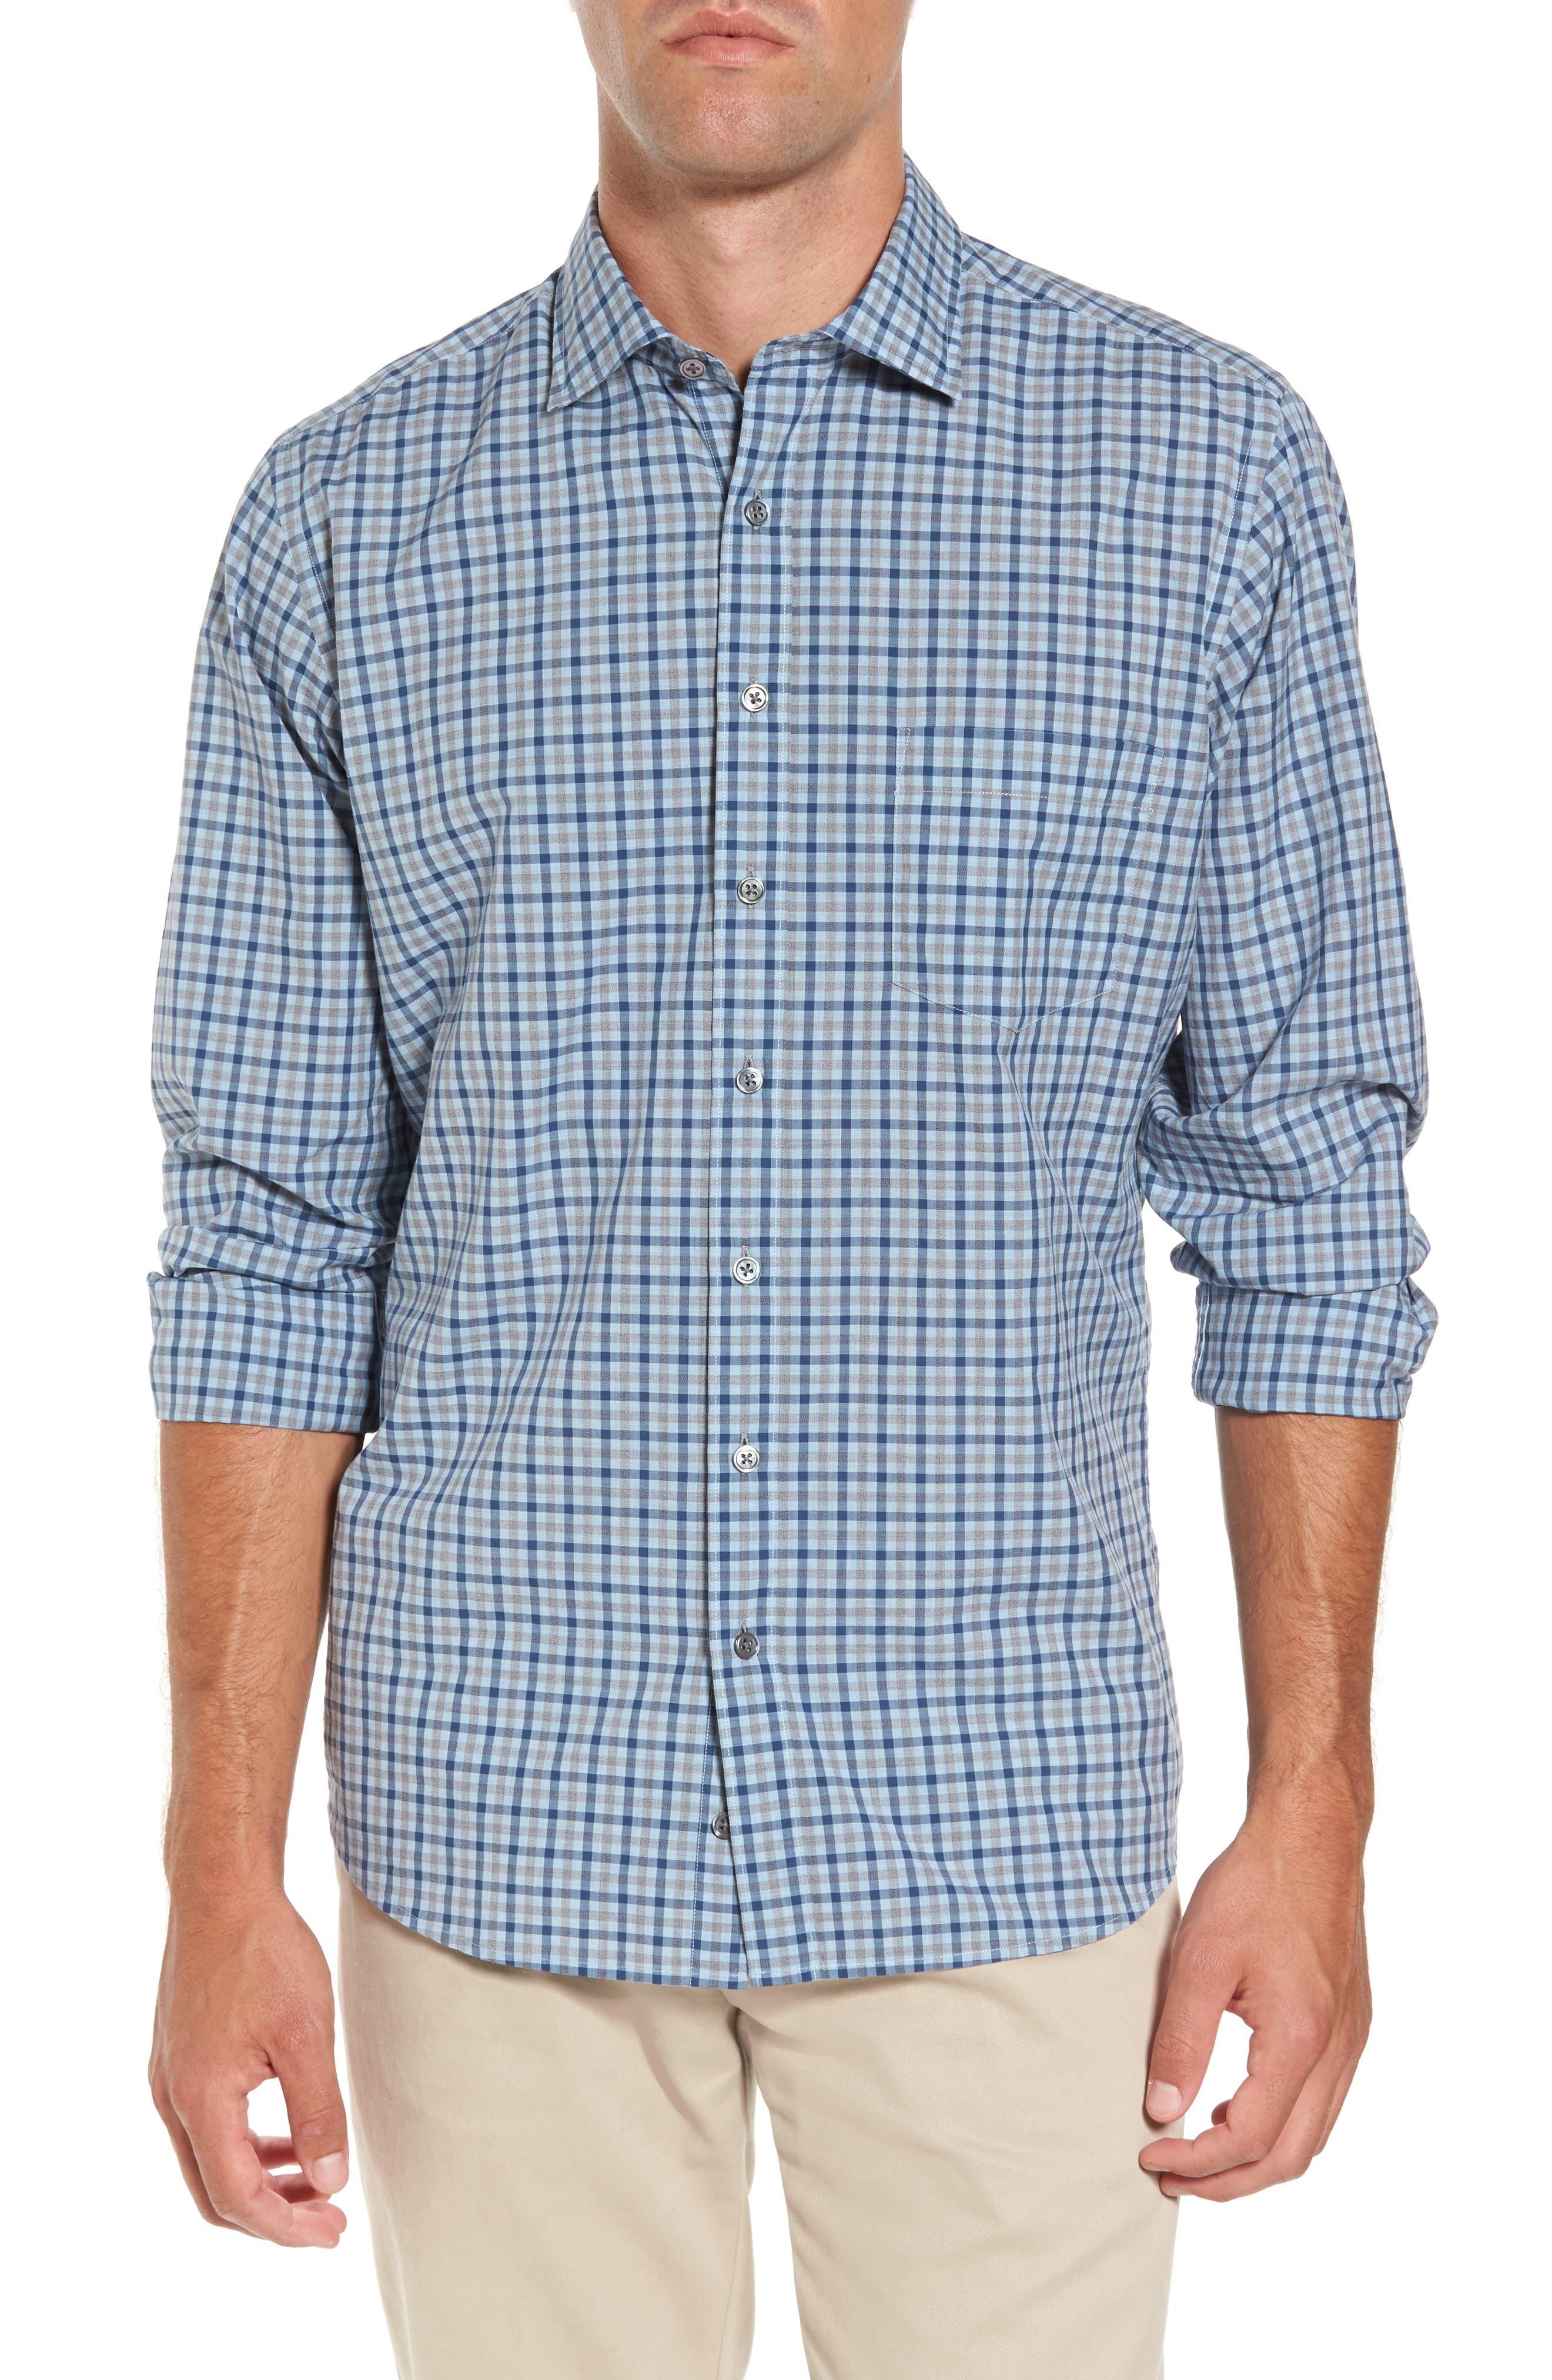 Main Image - Rodd & Gunn Charming Creek Regular Fit Sport Shirt